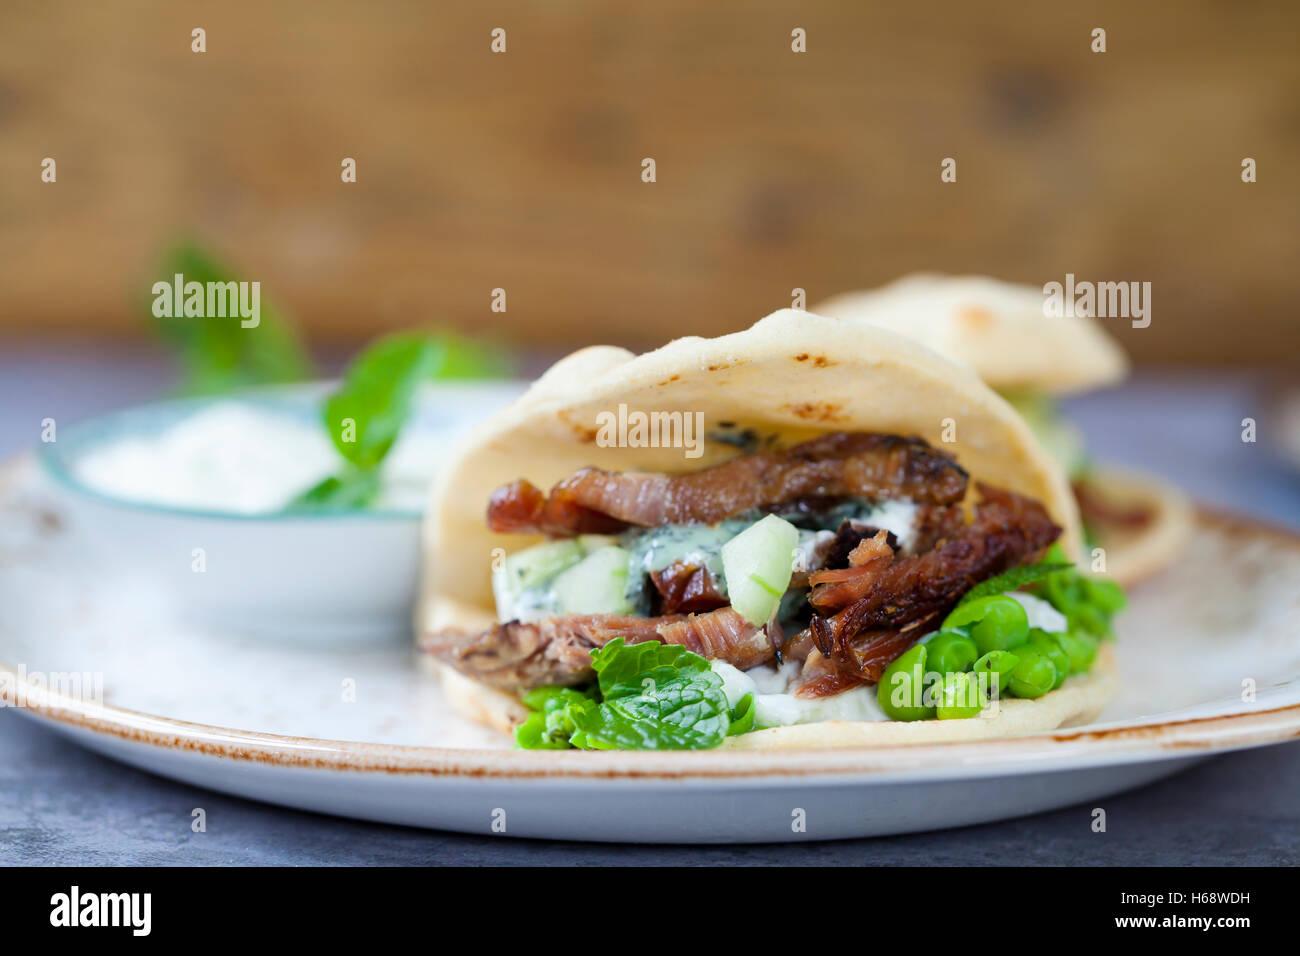 Mini flat breads with crispy lamb, mashed peas, cucumber, mint and yogurt sauce - Stock Image